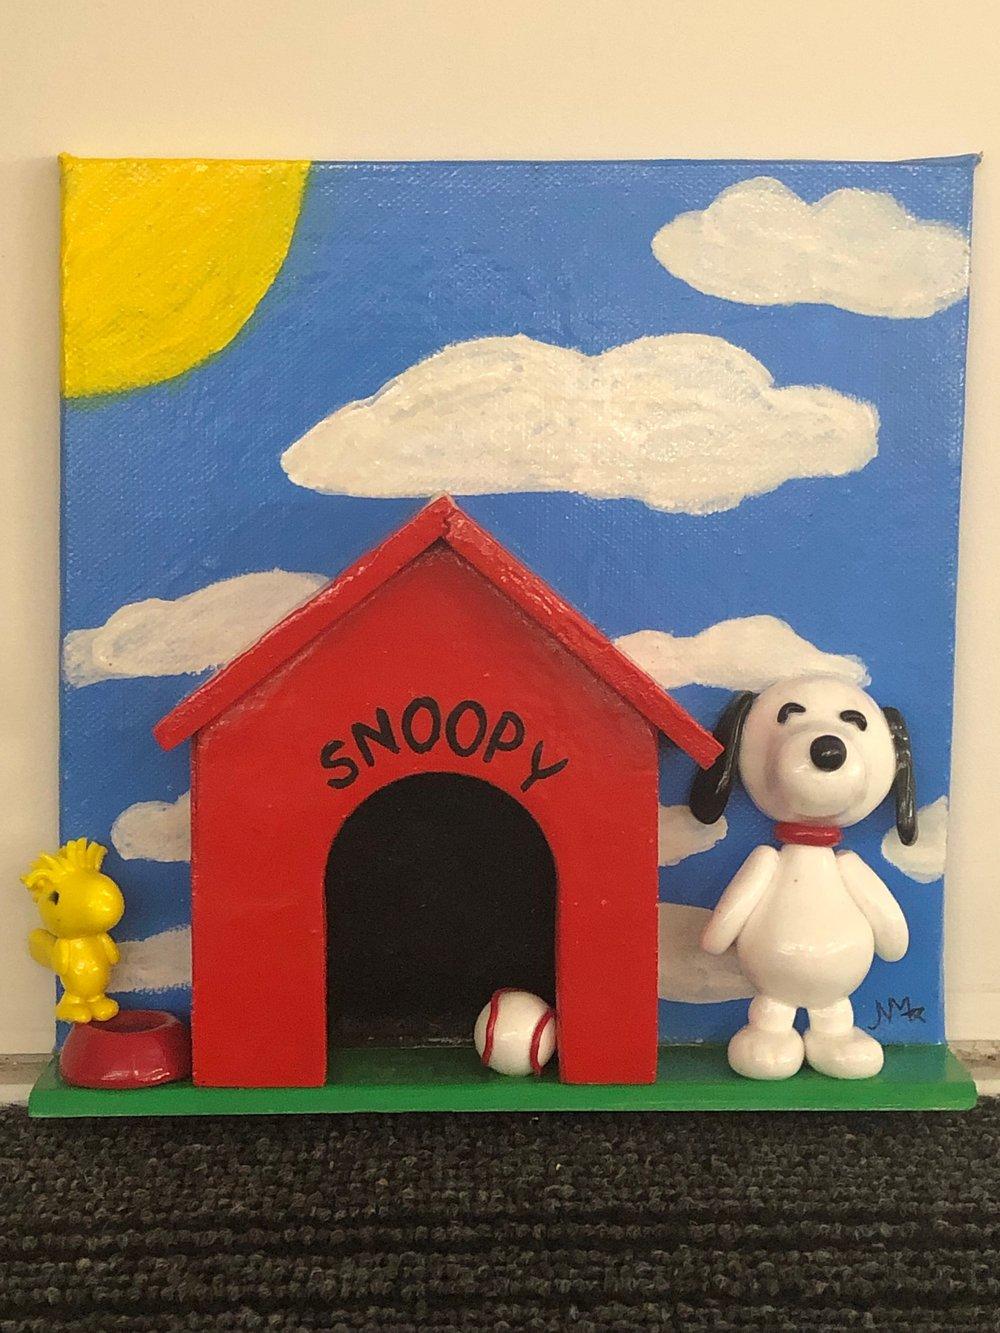 Snoopy.jpeg